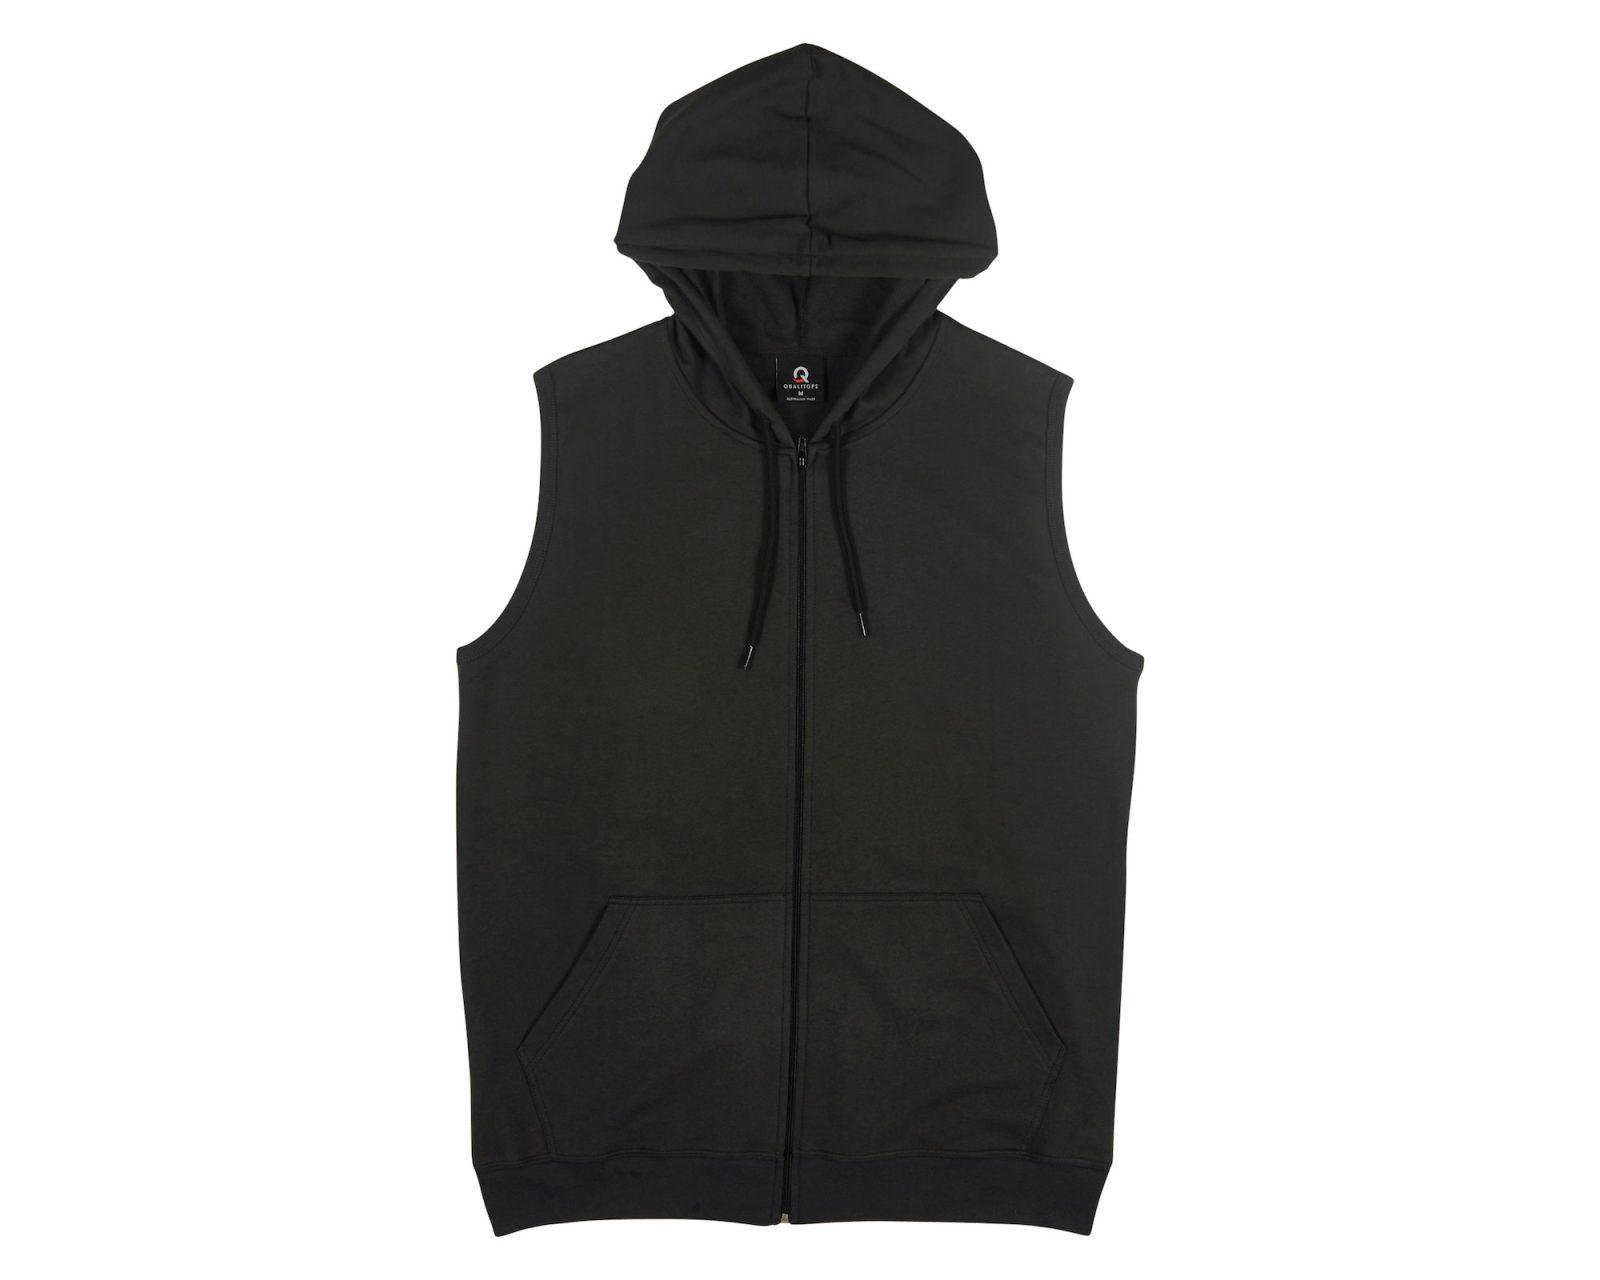 d00e6ce4782b7d Qualitops Custom Made Mens Sleeveless Zip Hoodie Polycotton Australian made  clothing